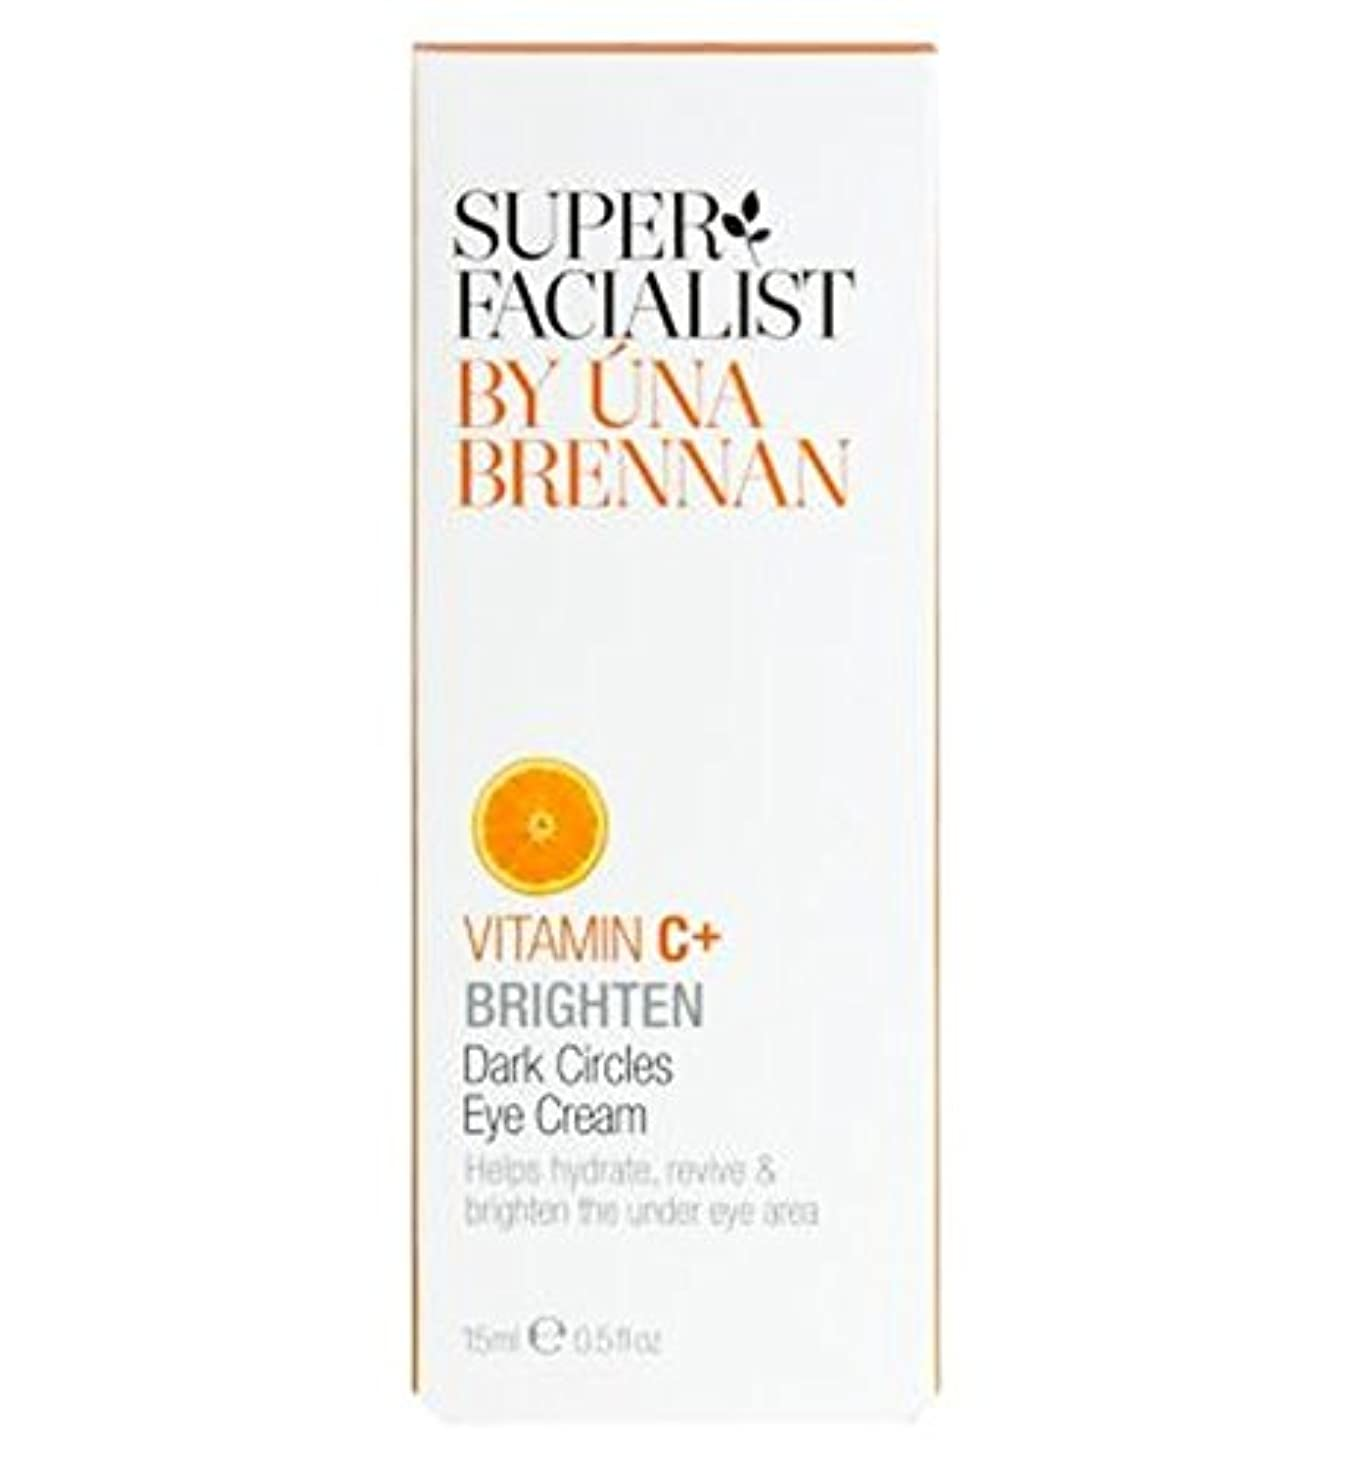 Superfacialist Vitamin C+ Dark Circles Eye Cream 15ml - SuperfacialistビタミンC +くまアイクリーム15ミリリットル (Superfacialist)...